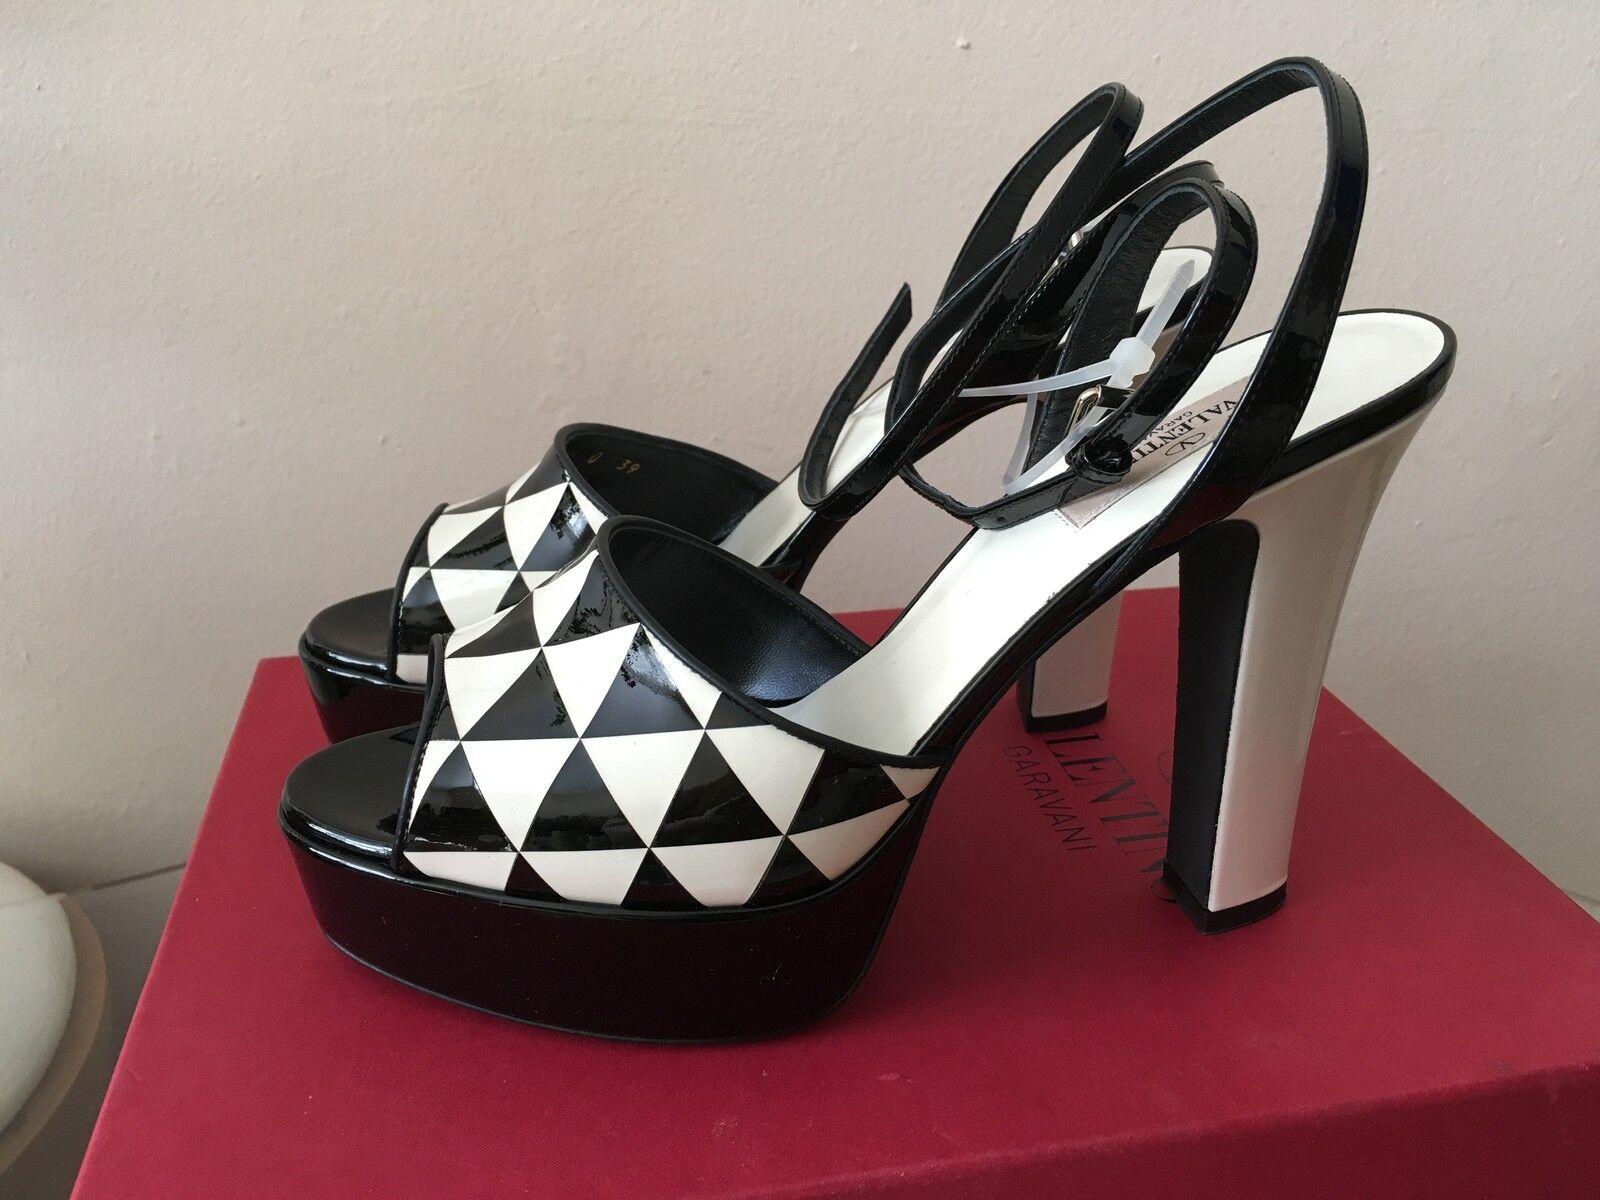 Luxury NEW Valentino Garavani Shiny Fever Patent Leather Sandals     1,095  9 50fc18